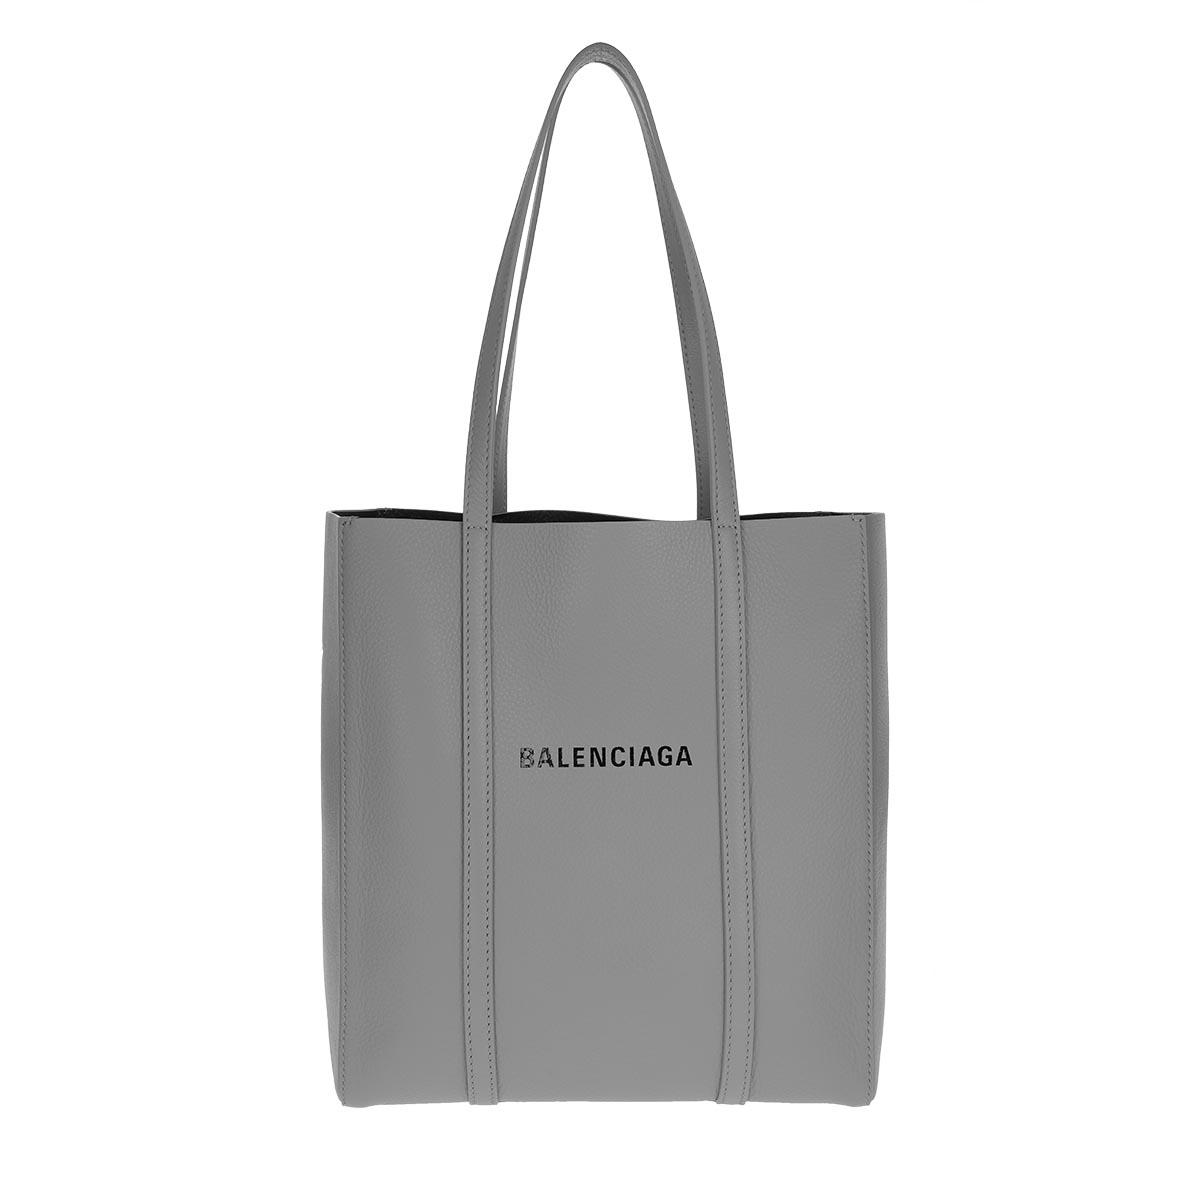 Balenciaga Tote - Everyday XS Tote Grey - in grau - für Damen